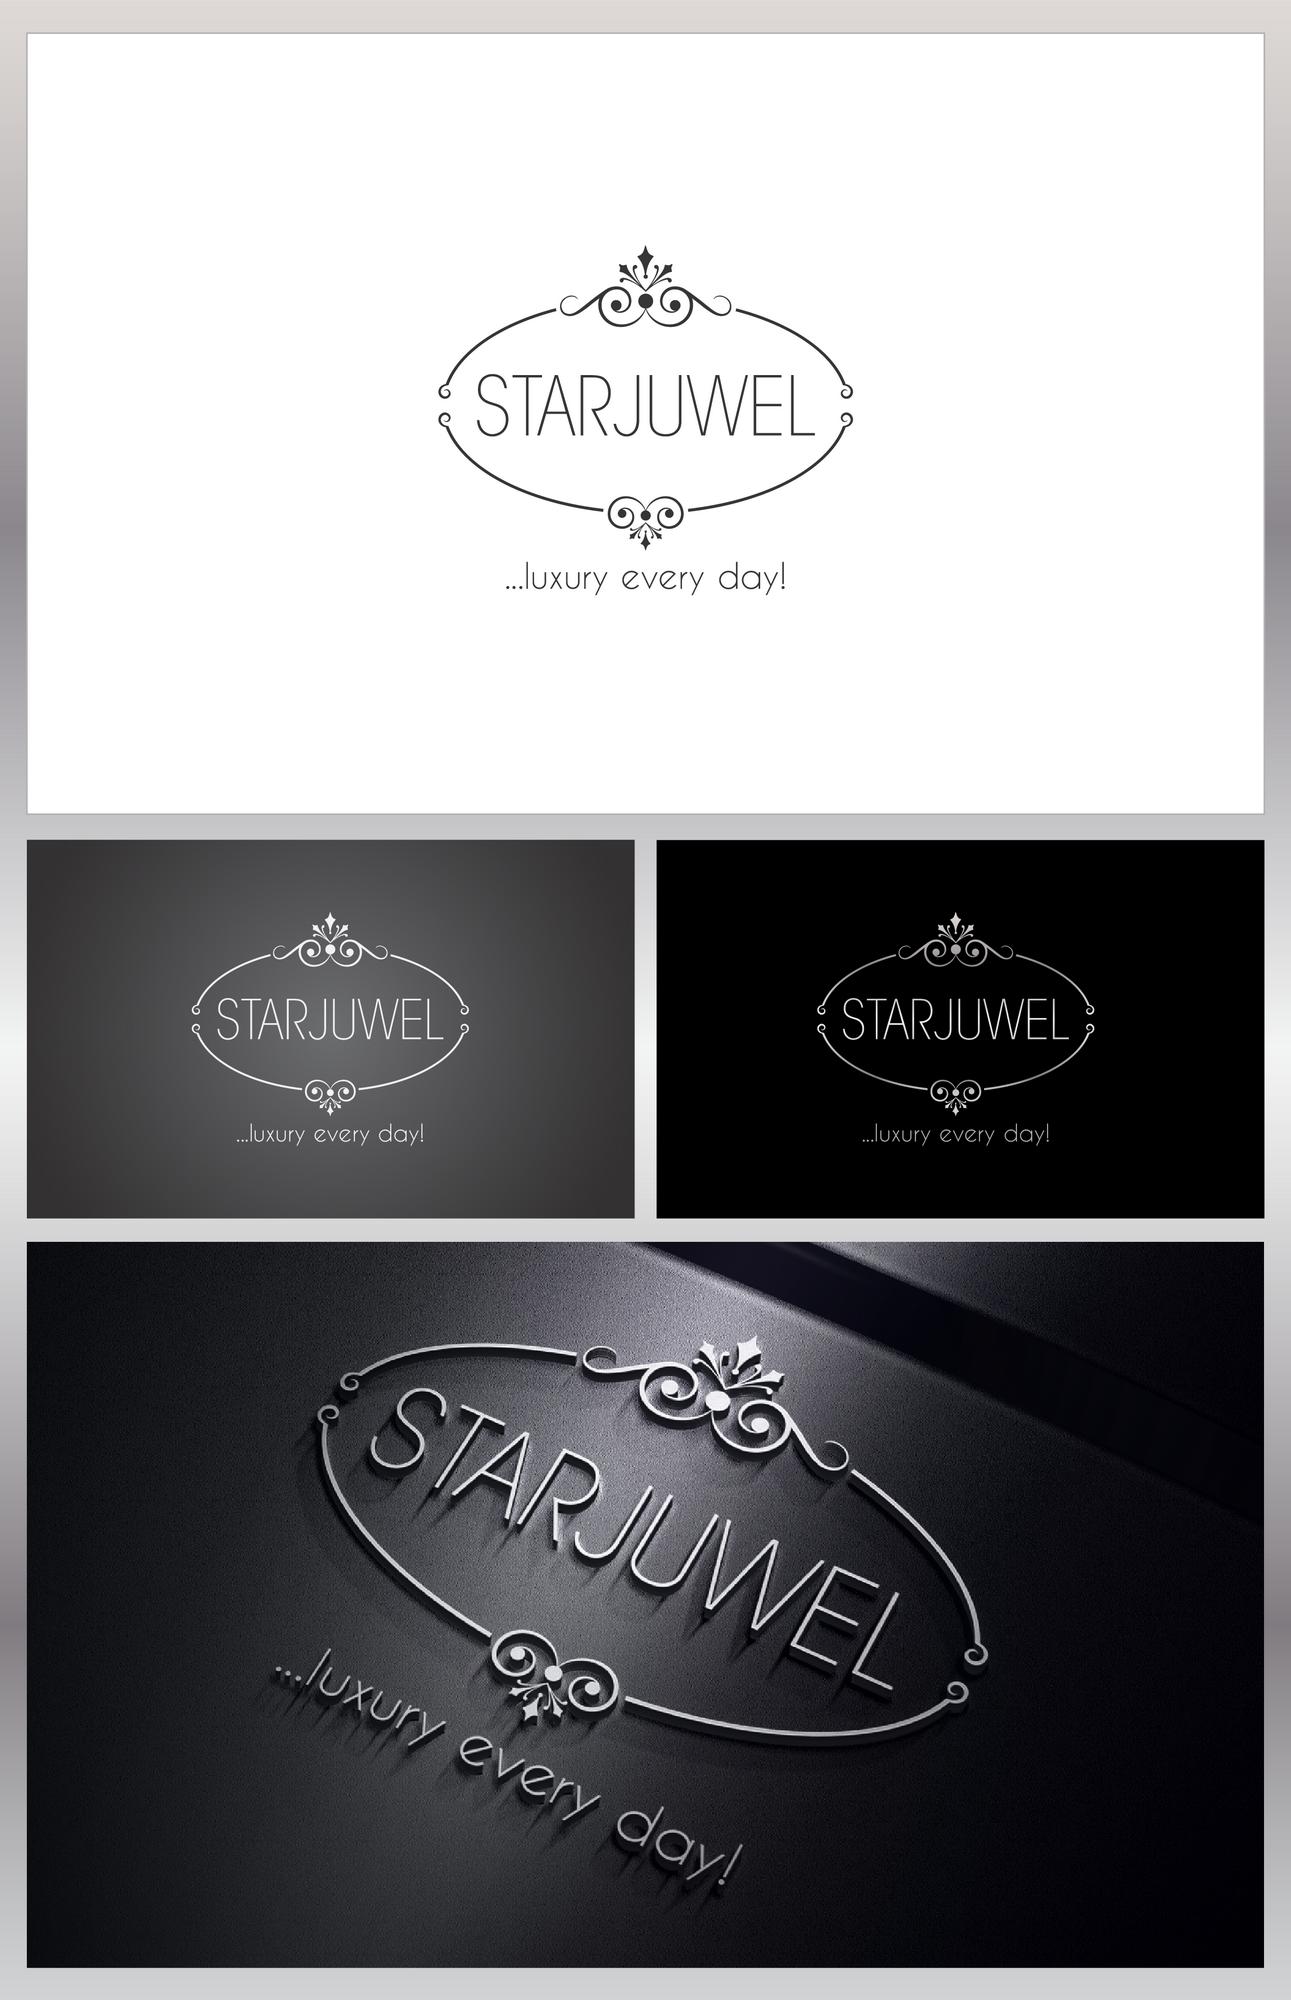 STARJUWEL benötigt ein logo